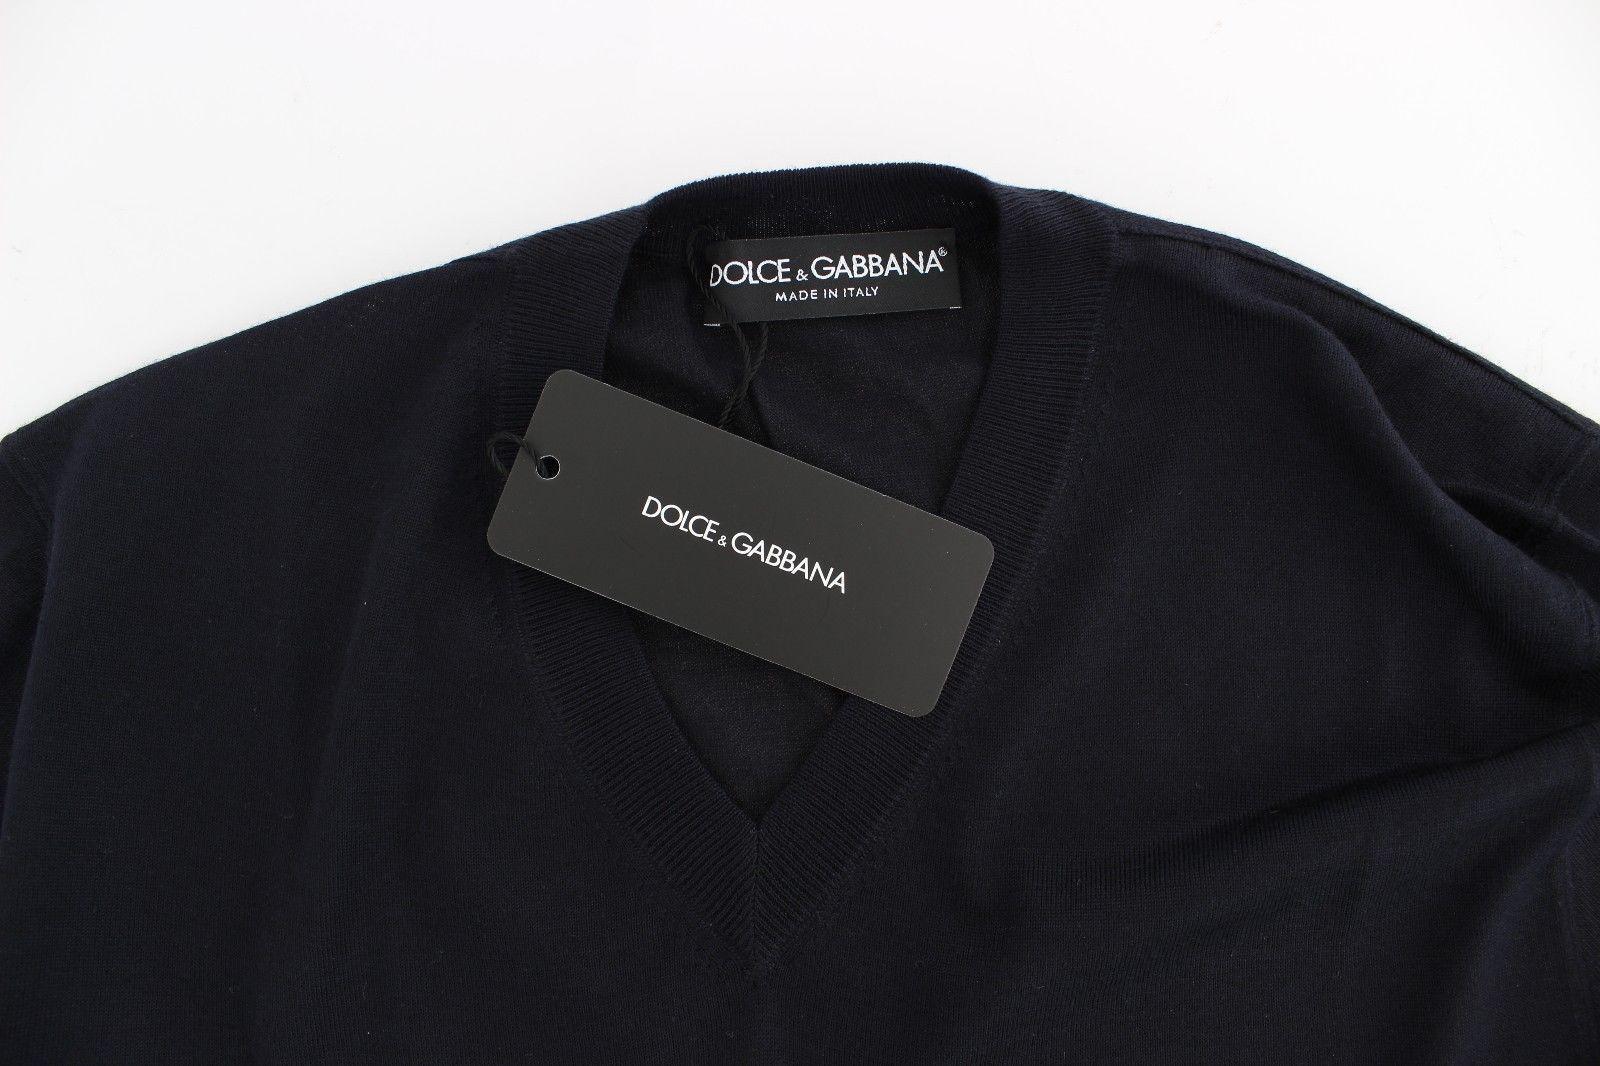 Dolce & Gabbana Blue Silk Cashmere V-neck Sweater Pullover 14925